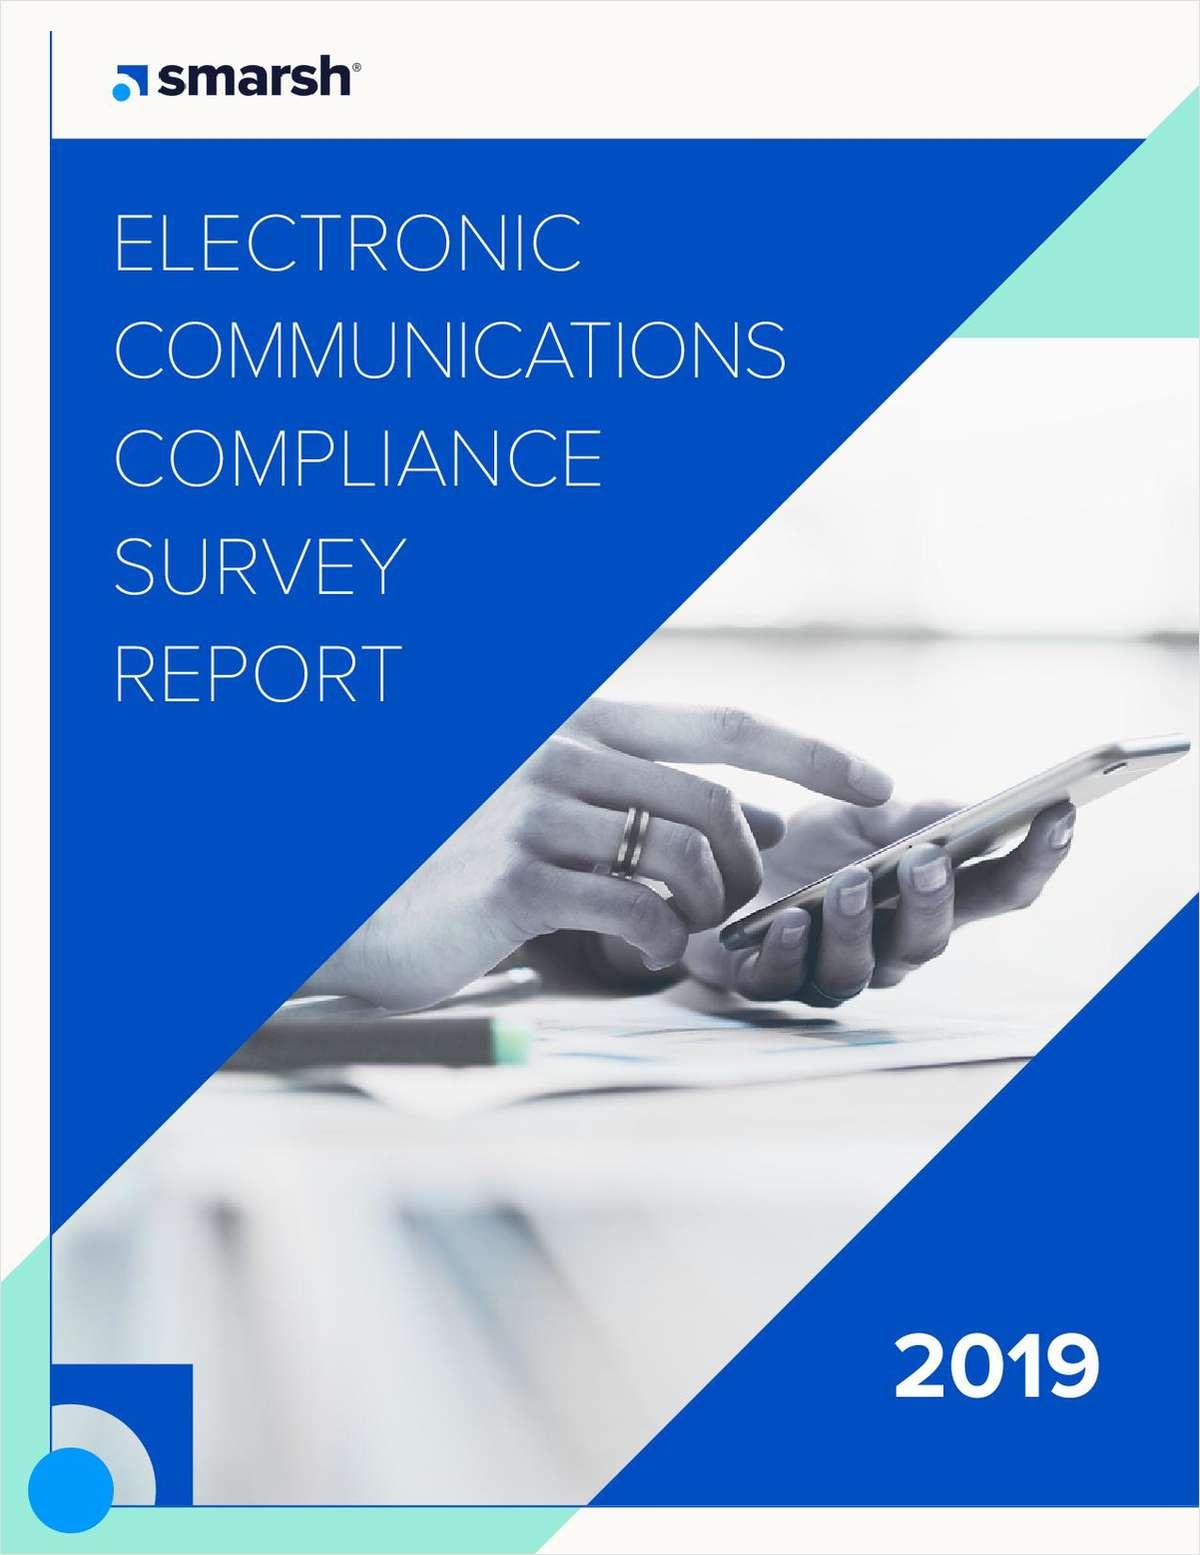 Electronic Communications Compliance Survey Report